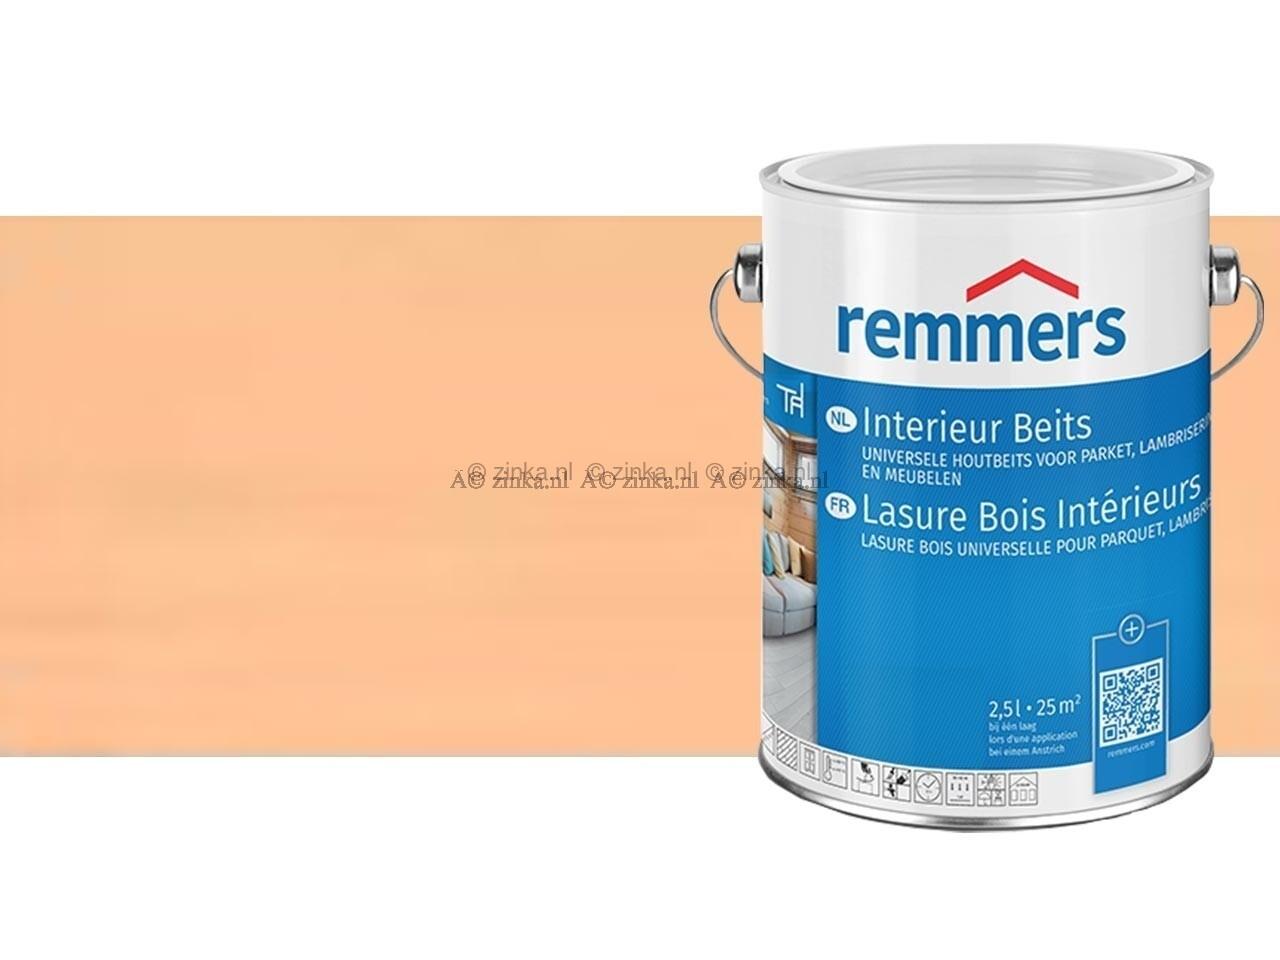 Interieur-Beits 2303 Berken 100ml proefverpakking